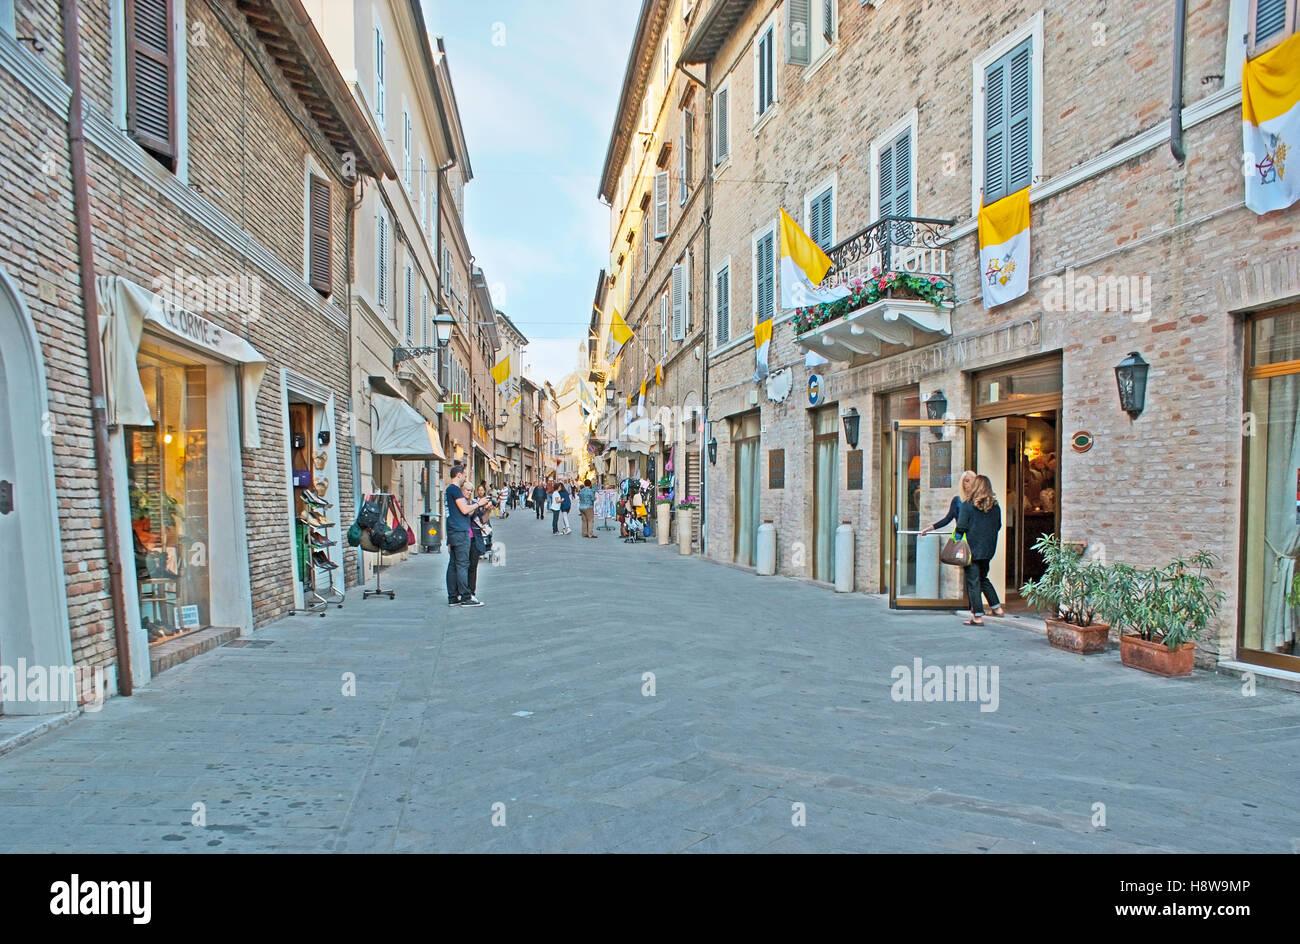 The central shopping street - Corso Traiano Boccalini, leads to Basilica of Santa Casa - Stock Image